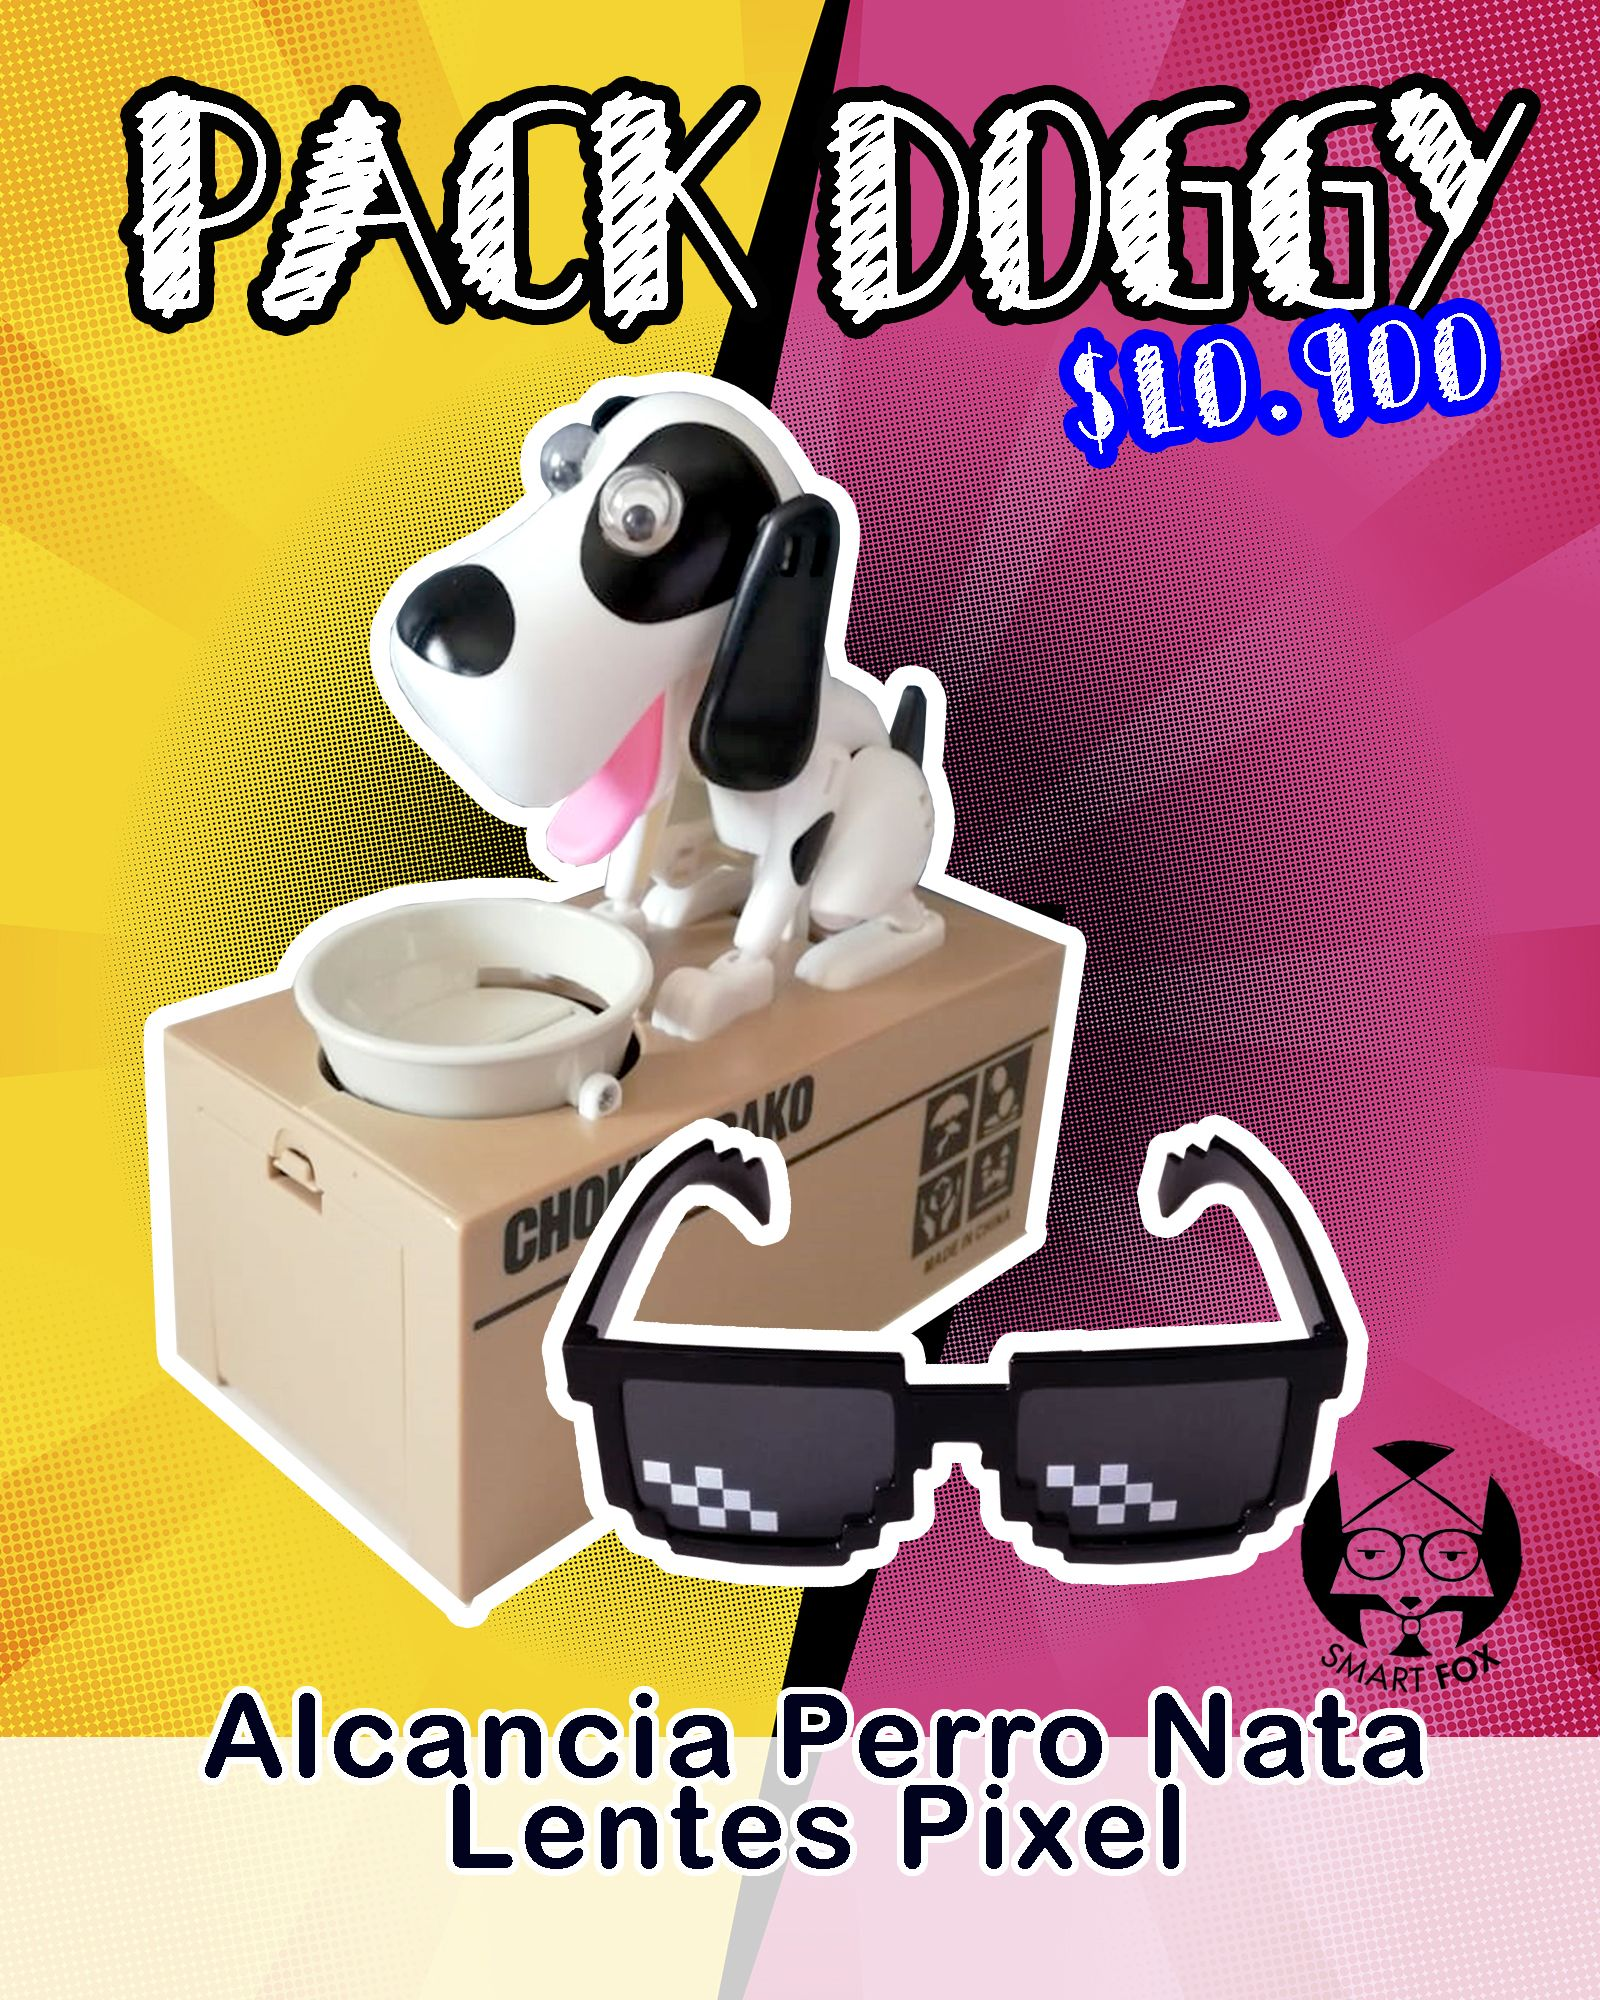 Pack Doggy Nata